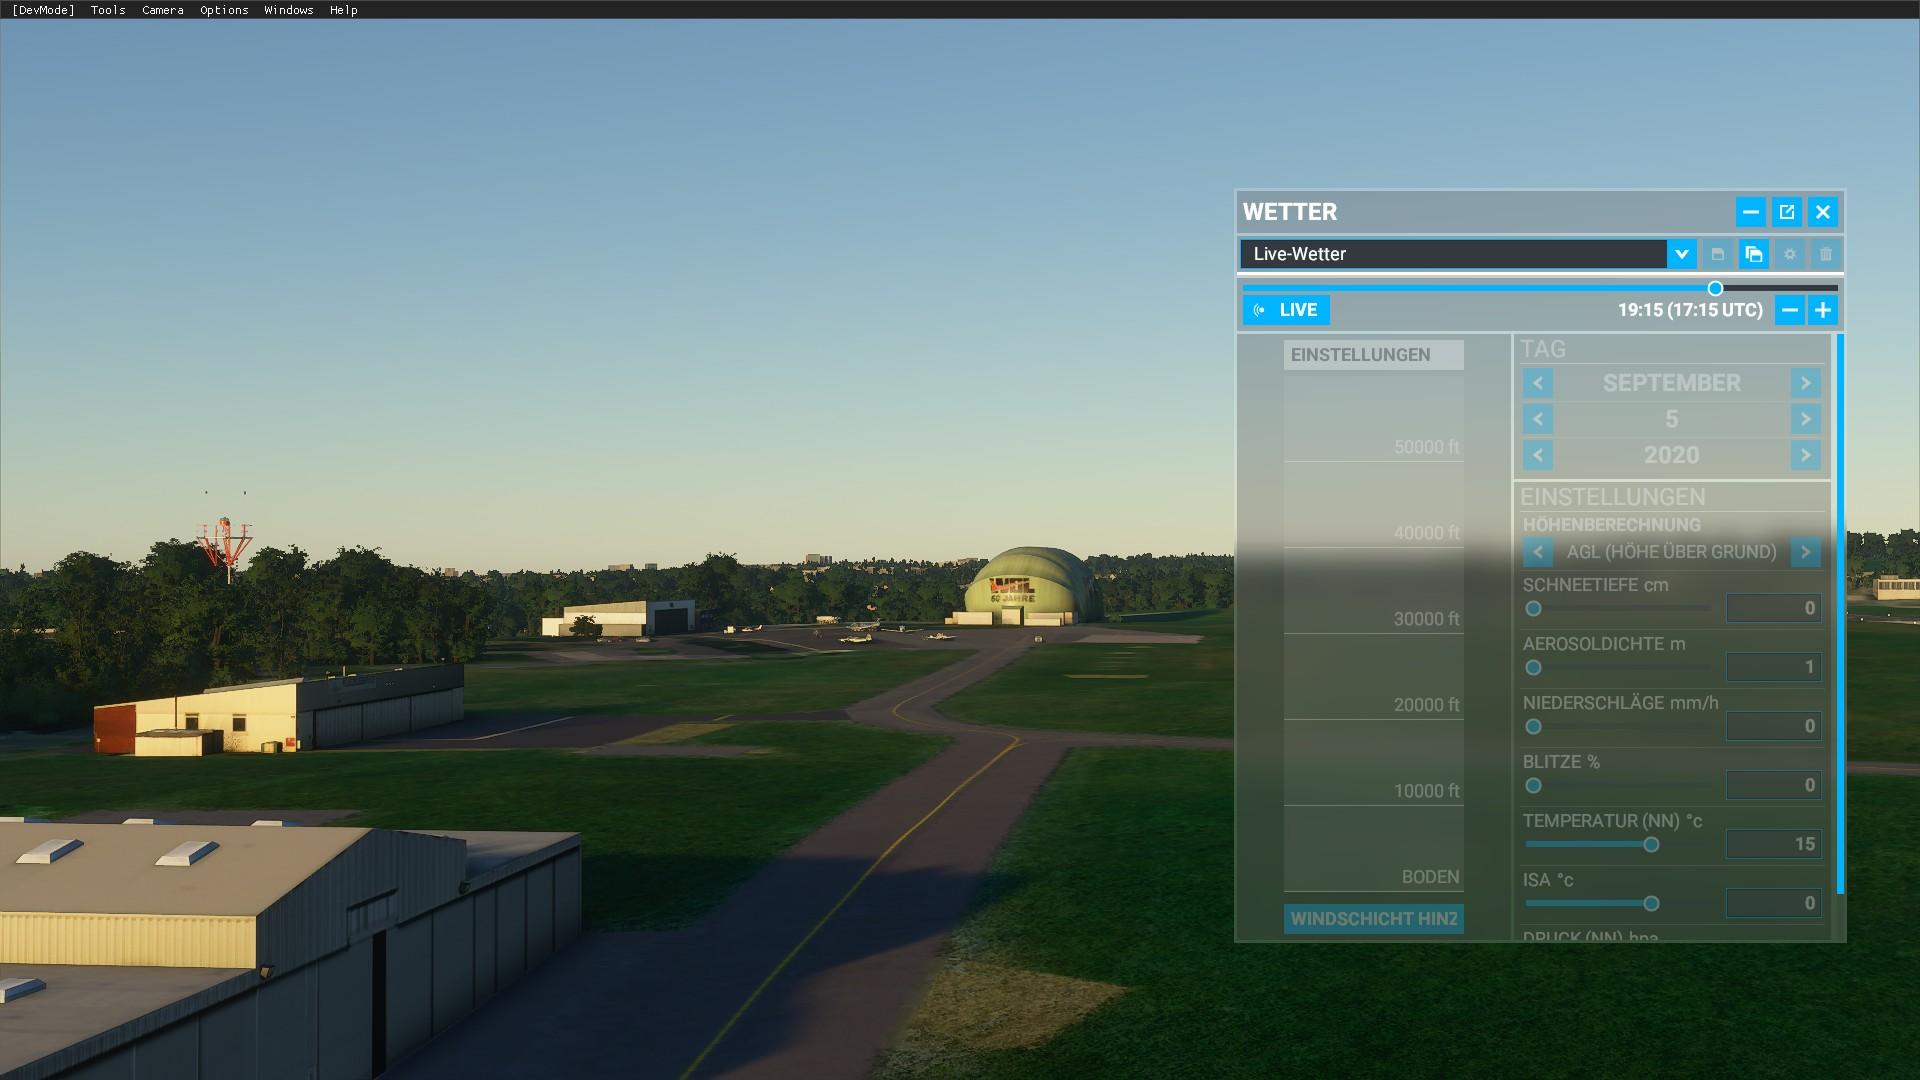 mfs_flughafen_edle_hangar_blimp_8.jpg